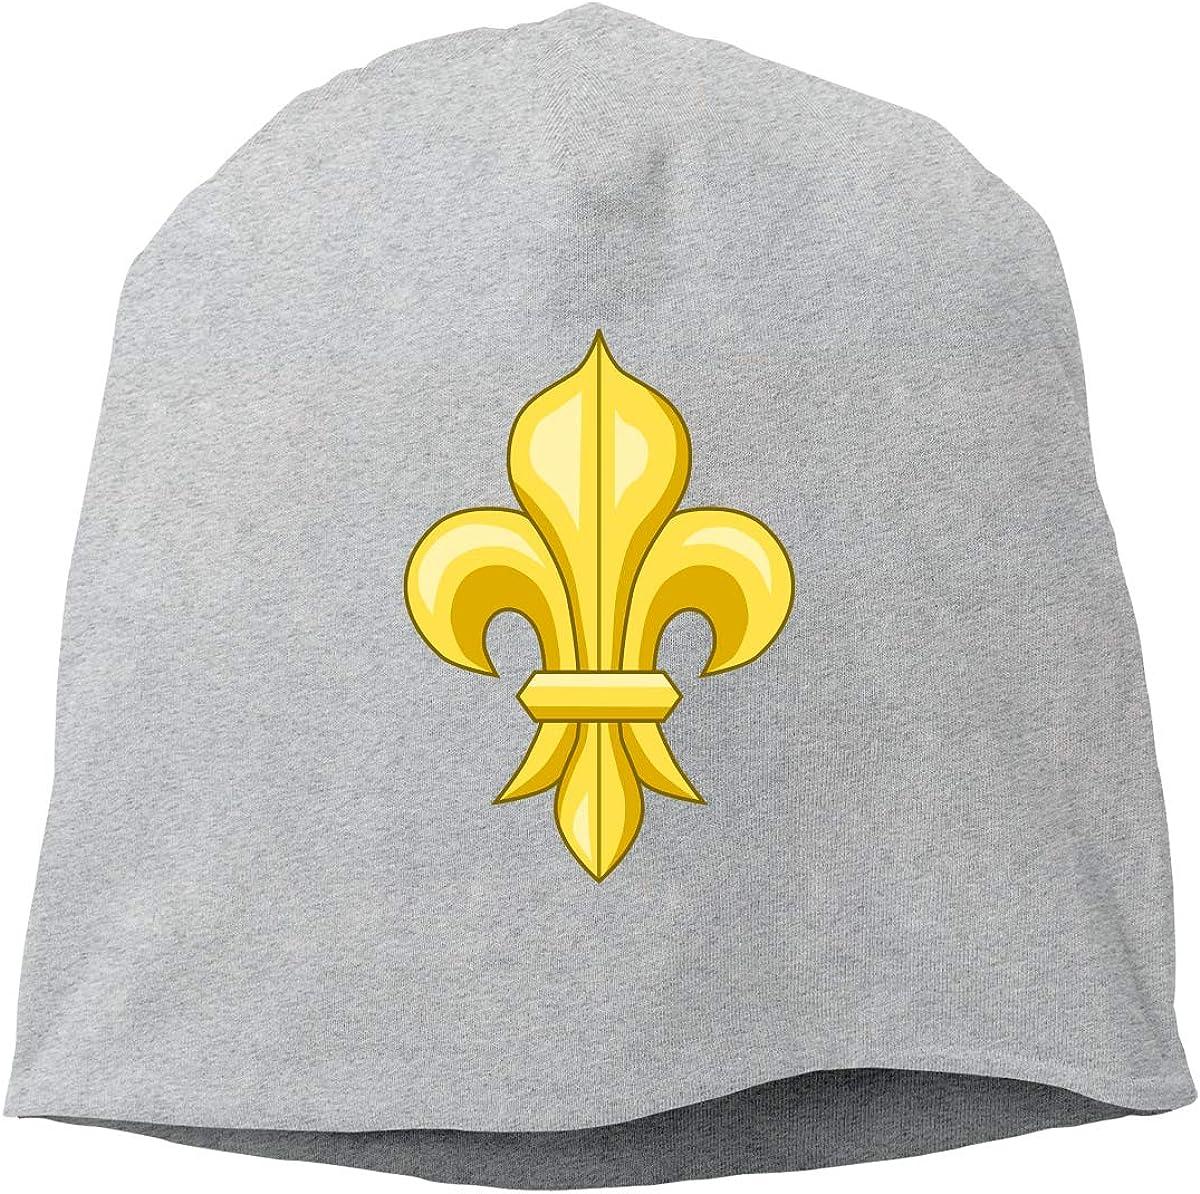 Fleur De LYS Unisex Knitted Hat Beanie Hat Warm Hats Skull Cap